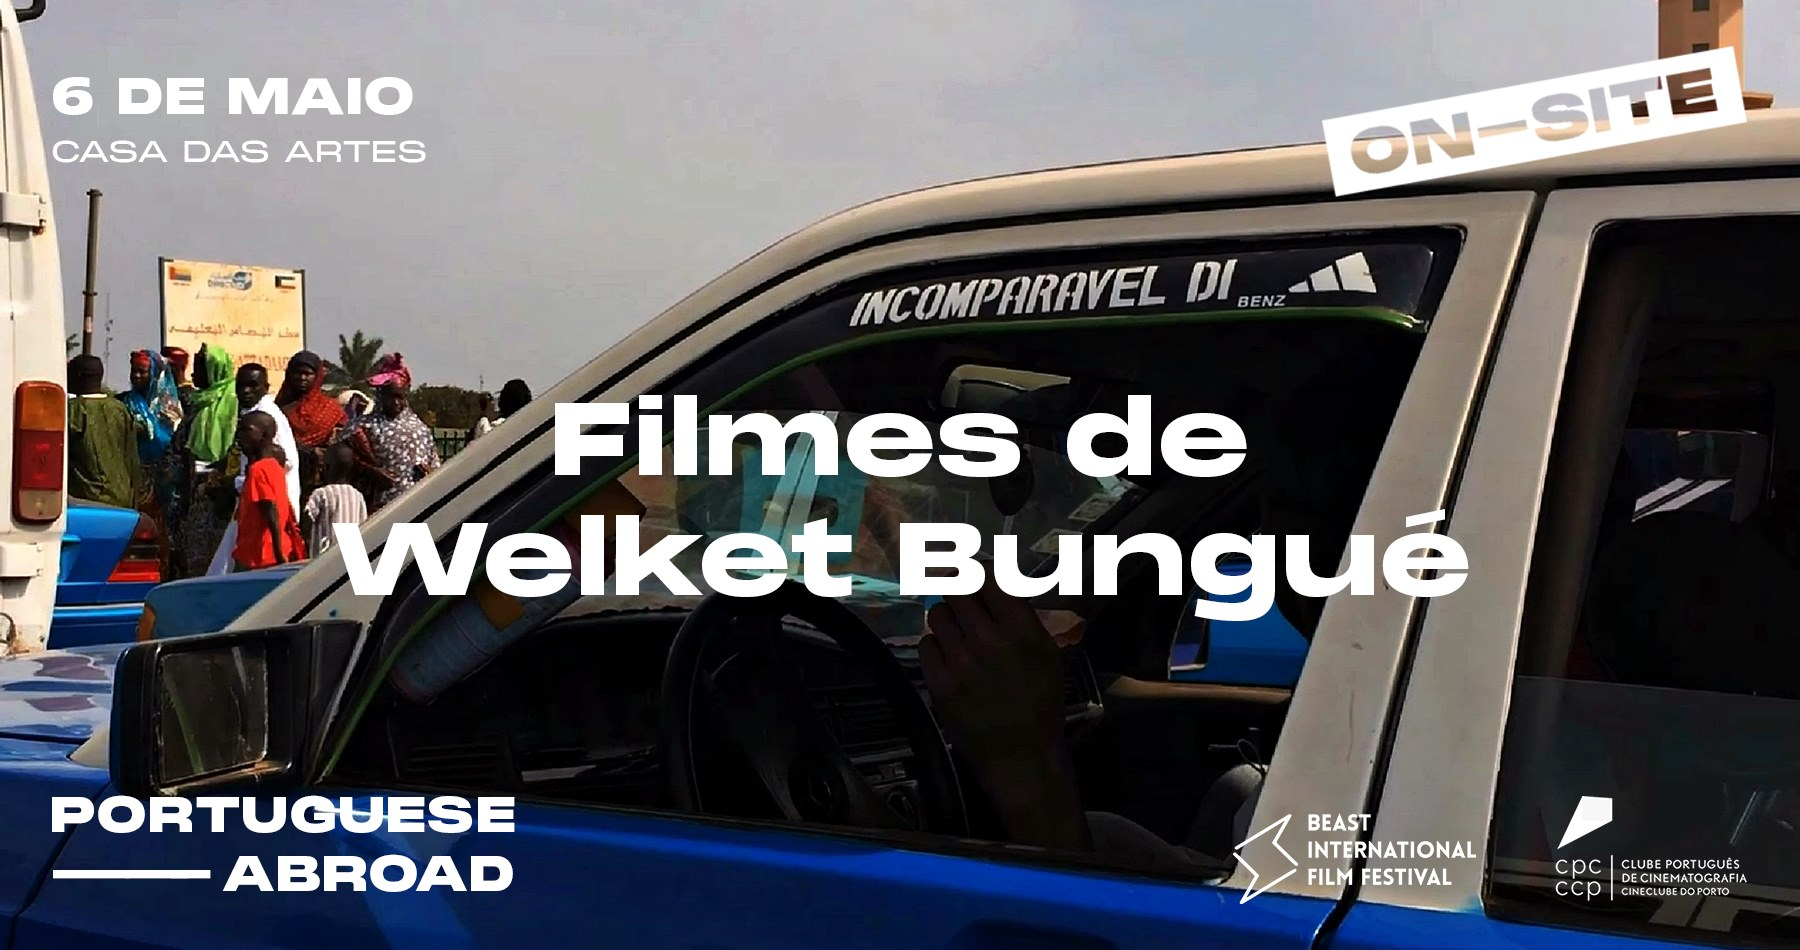 BEAST IFF ON-SITE #3 | Portuguese Abroad com Welket Bungué